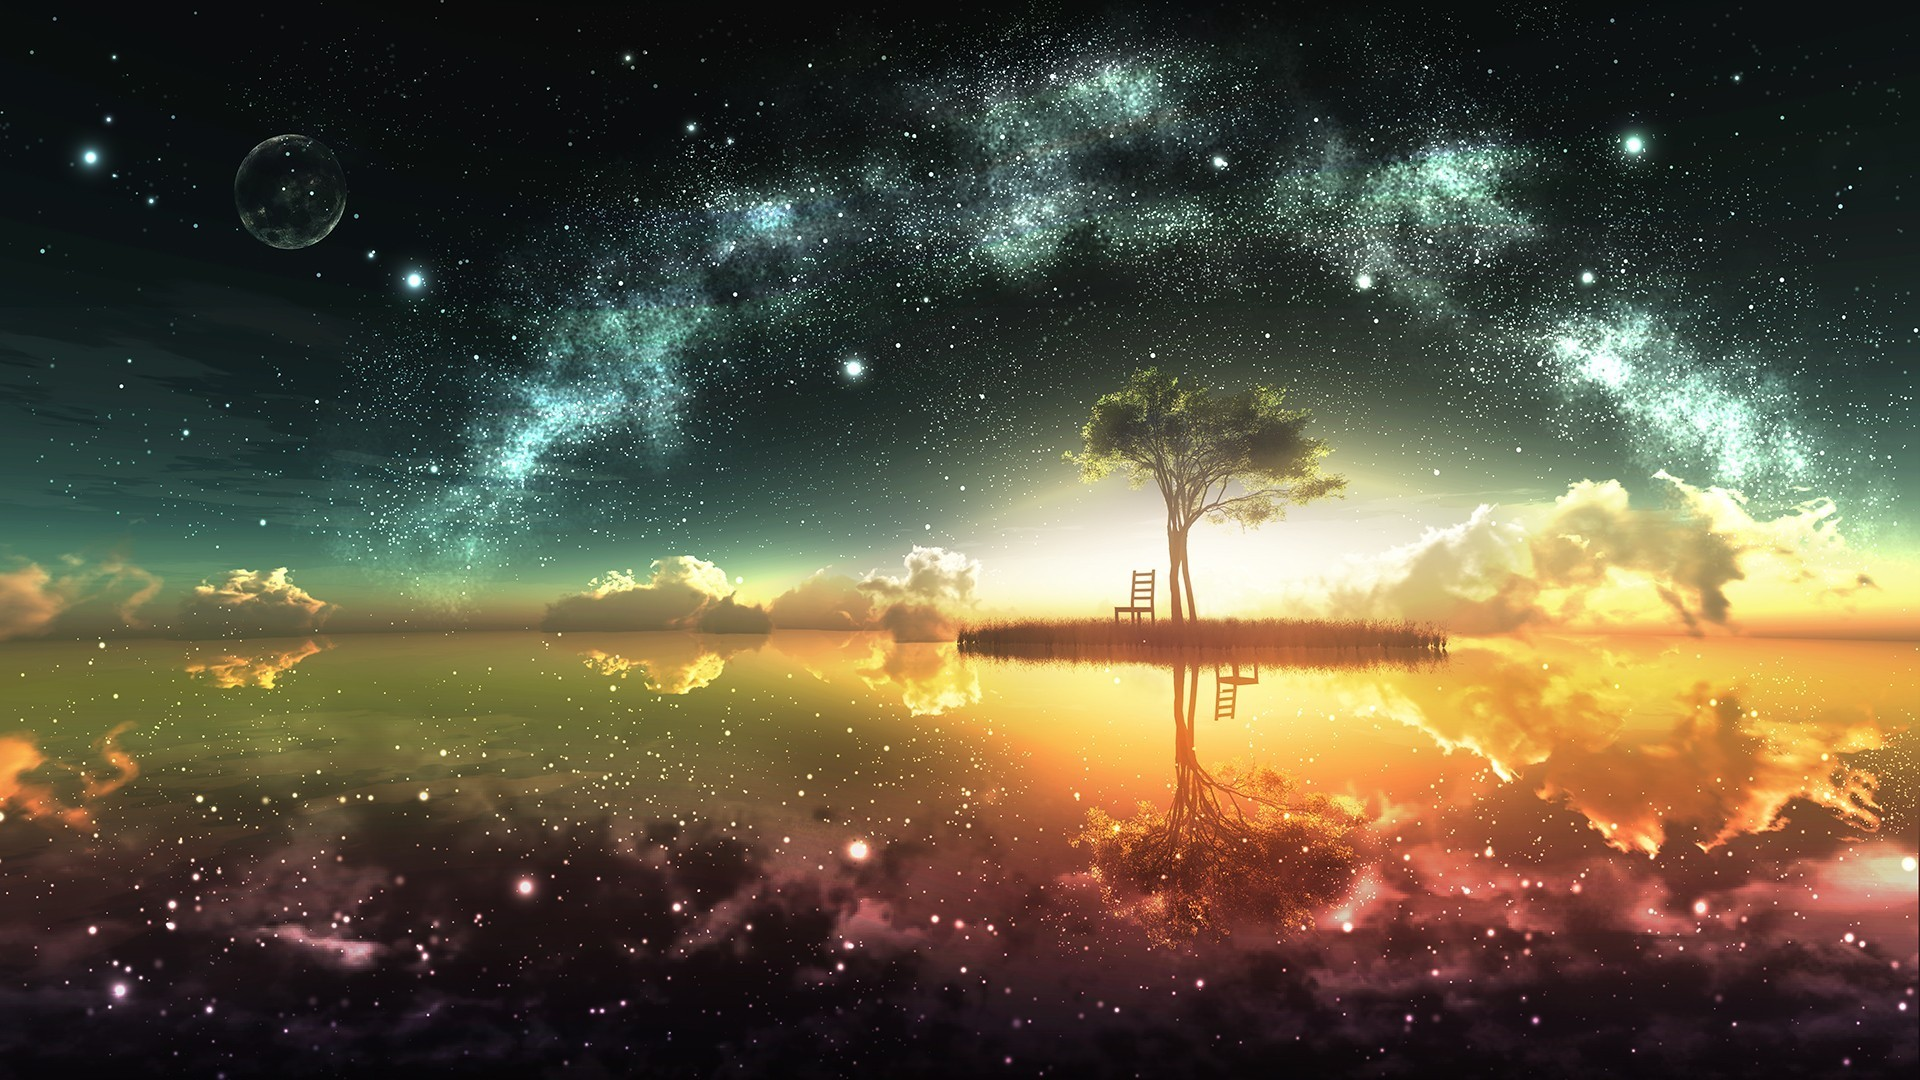 General 1920x1080 sky lake fantasy art colorful digital art trees space space art stars artwork reflection anime water chair Moon island clouds sunset bonsai